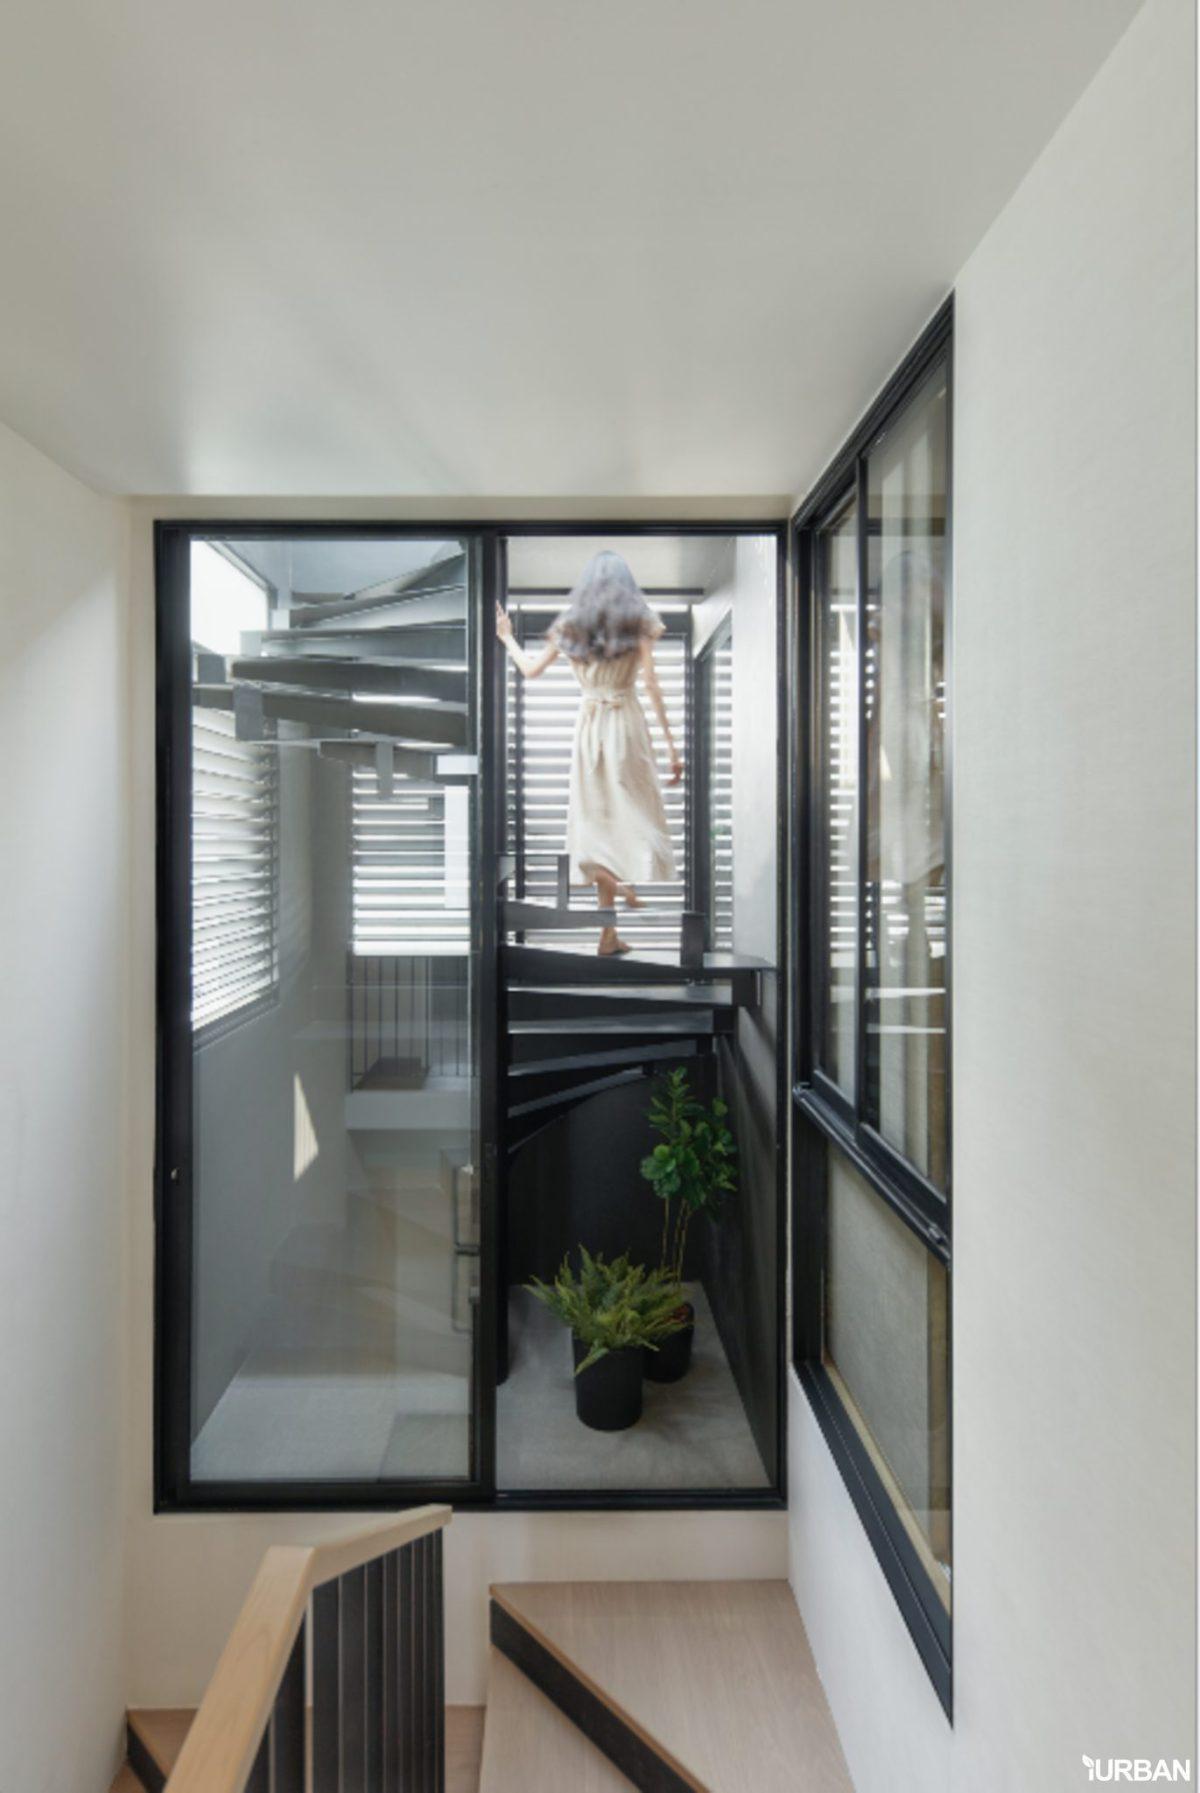 AIRES RAMA9 รีวิว Luxury Townhome 3.5 ชั้น + Rooftop ออกแบบสวย ย่านพระราม9 (ใกล้ รพ.สมิติเวช) 81 - AIRES